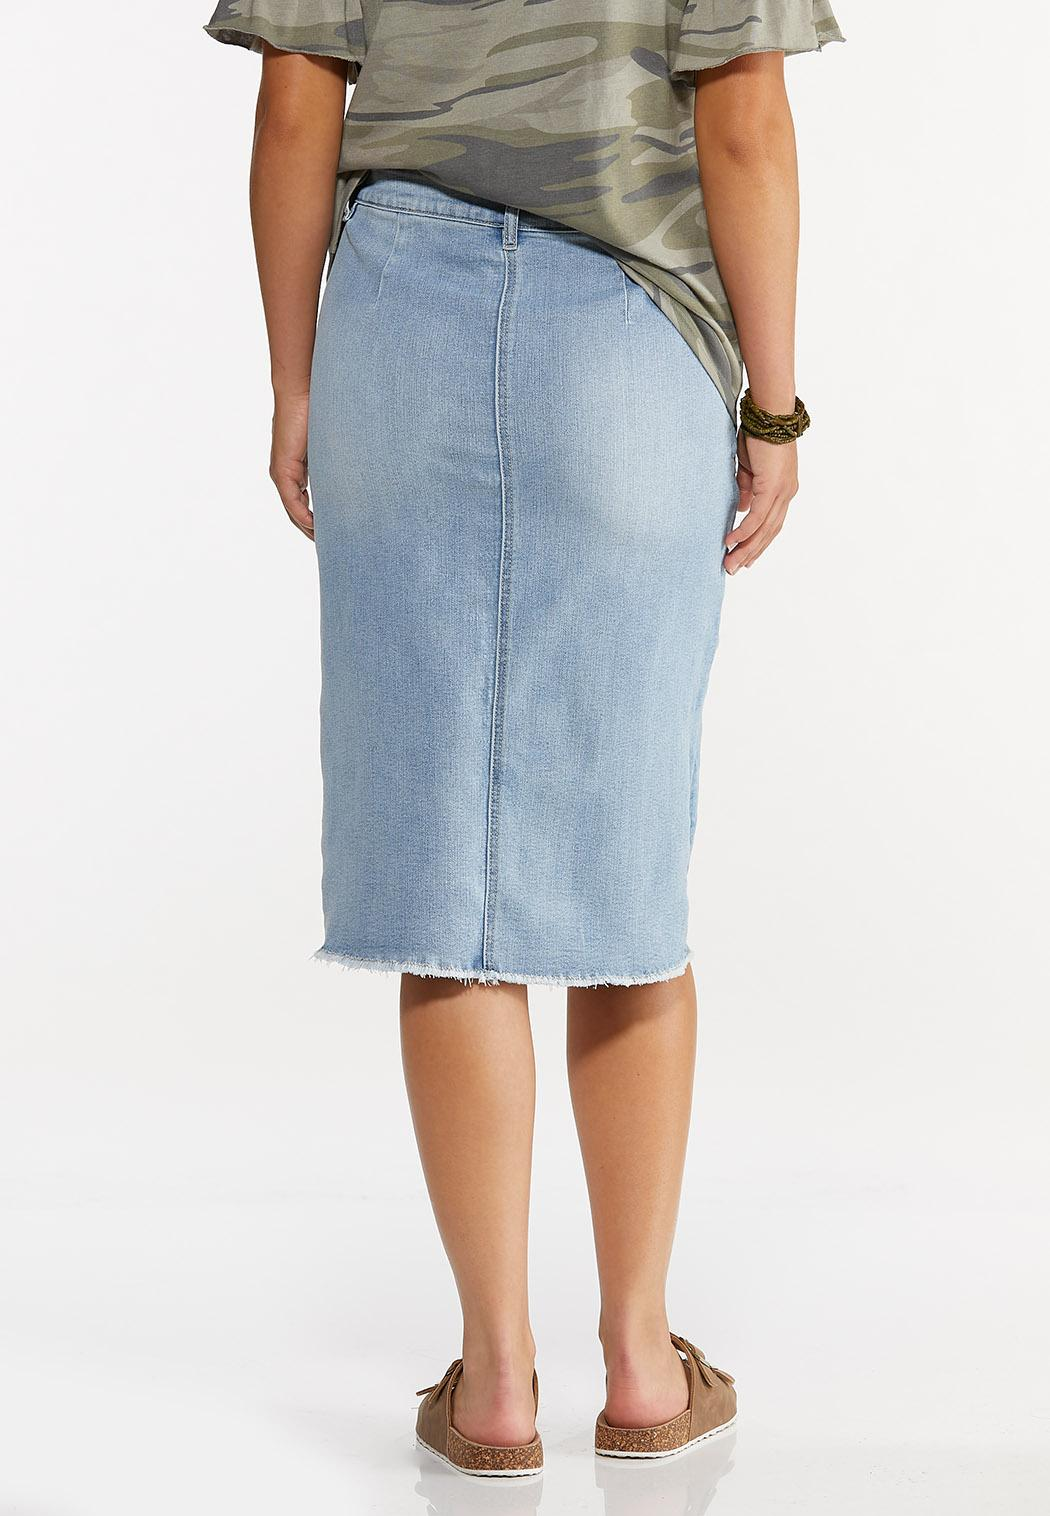 Distressed Button Front Denim Skirt (Item #44626980)